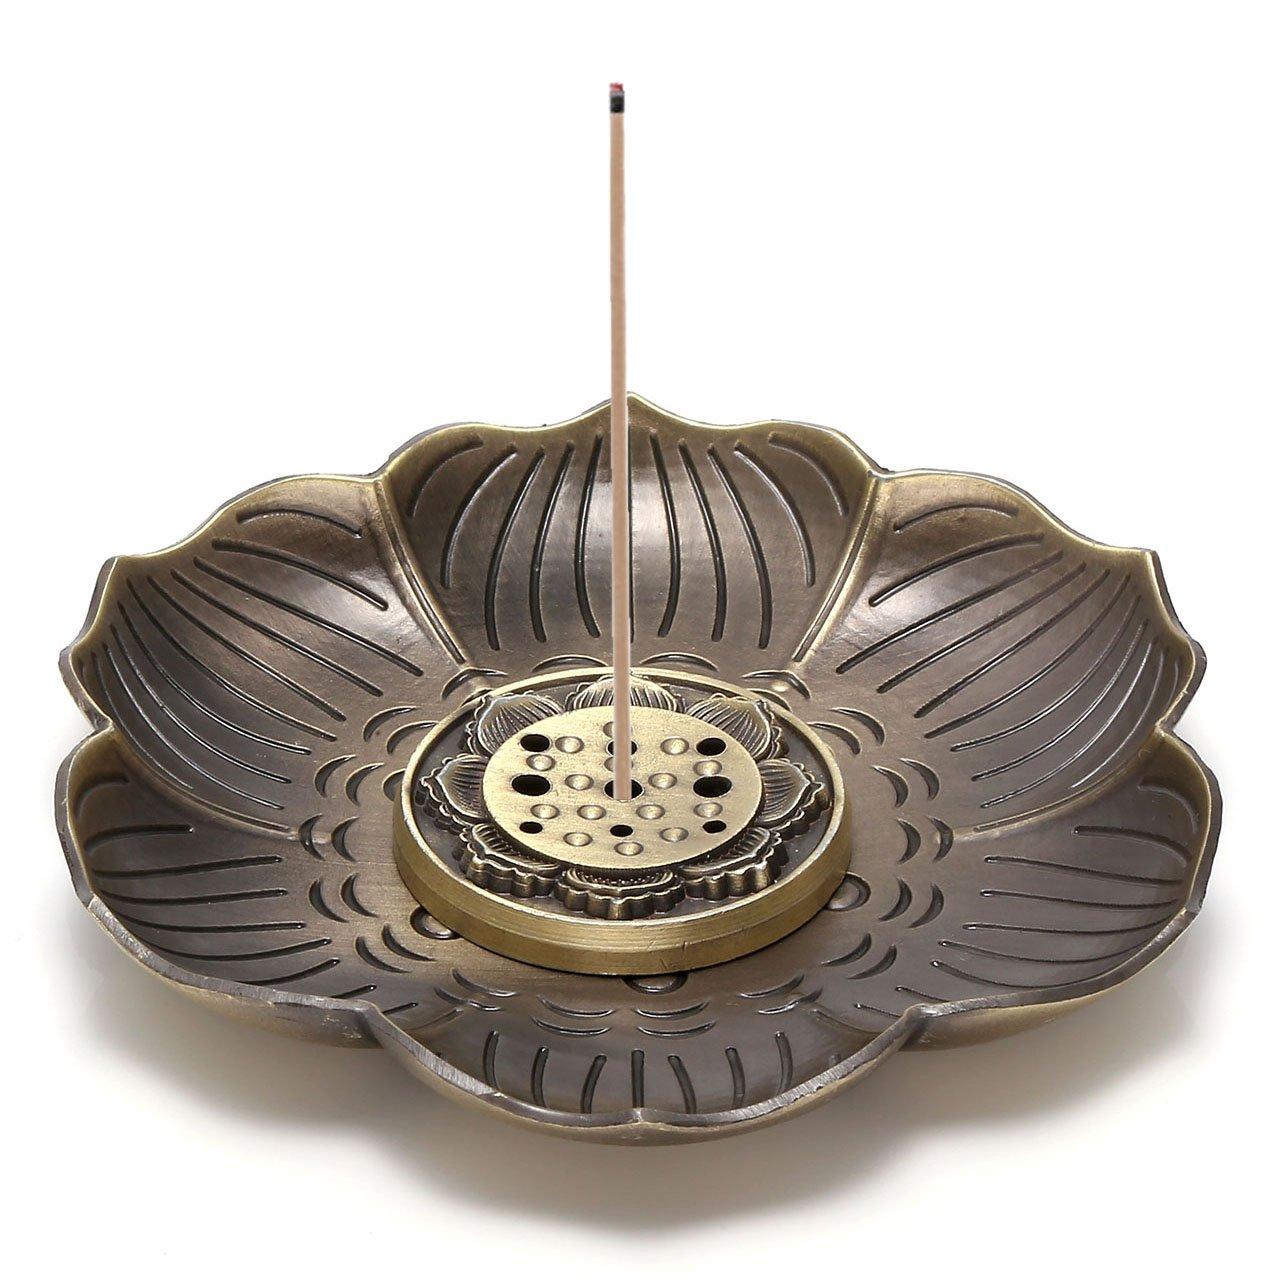 Jovivi Brass Incense Holder - Lotus Stick Incense Burner and Cone Incense Holder with Ash Catcher(9 Holes)